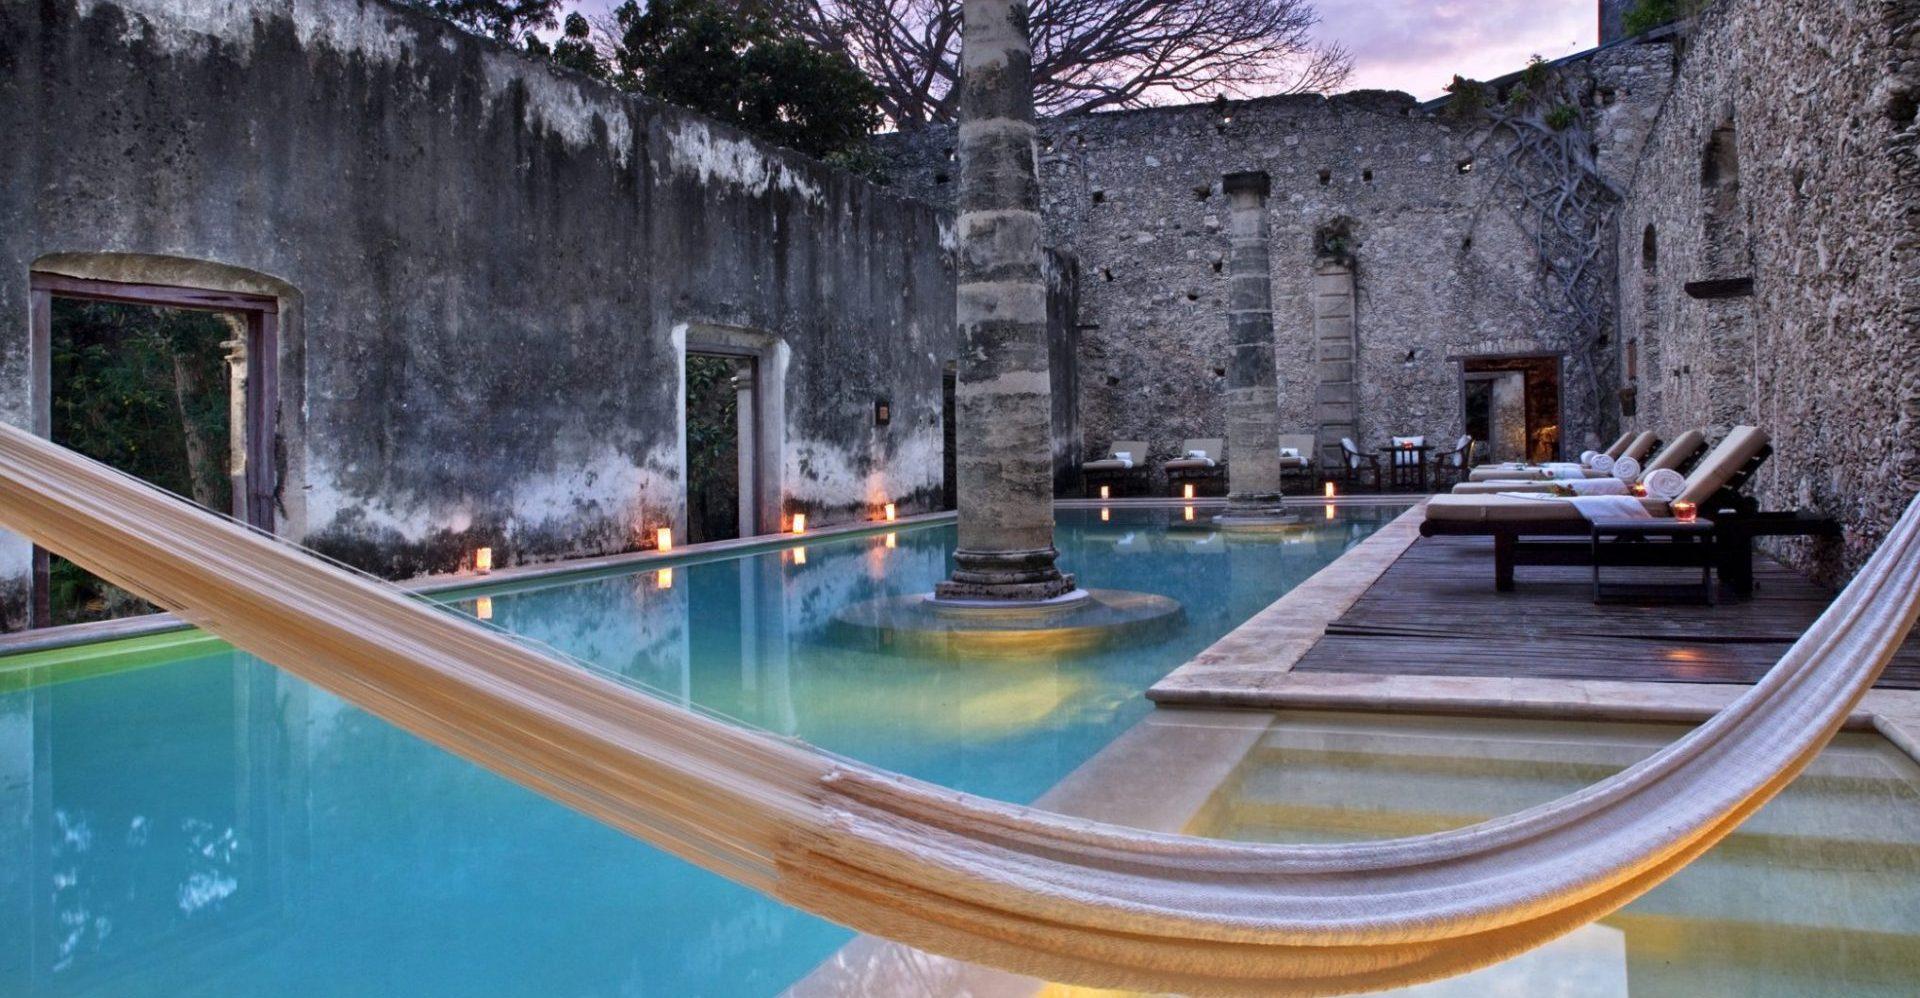 Mexiko, Hacienda Uayamon, Pool, Hängematte, Latin America Tours, Reisen